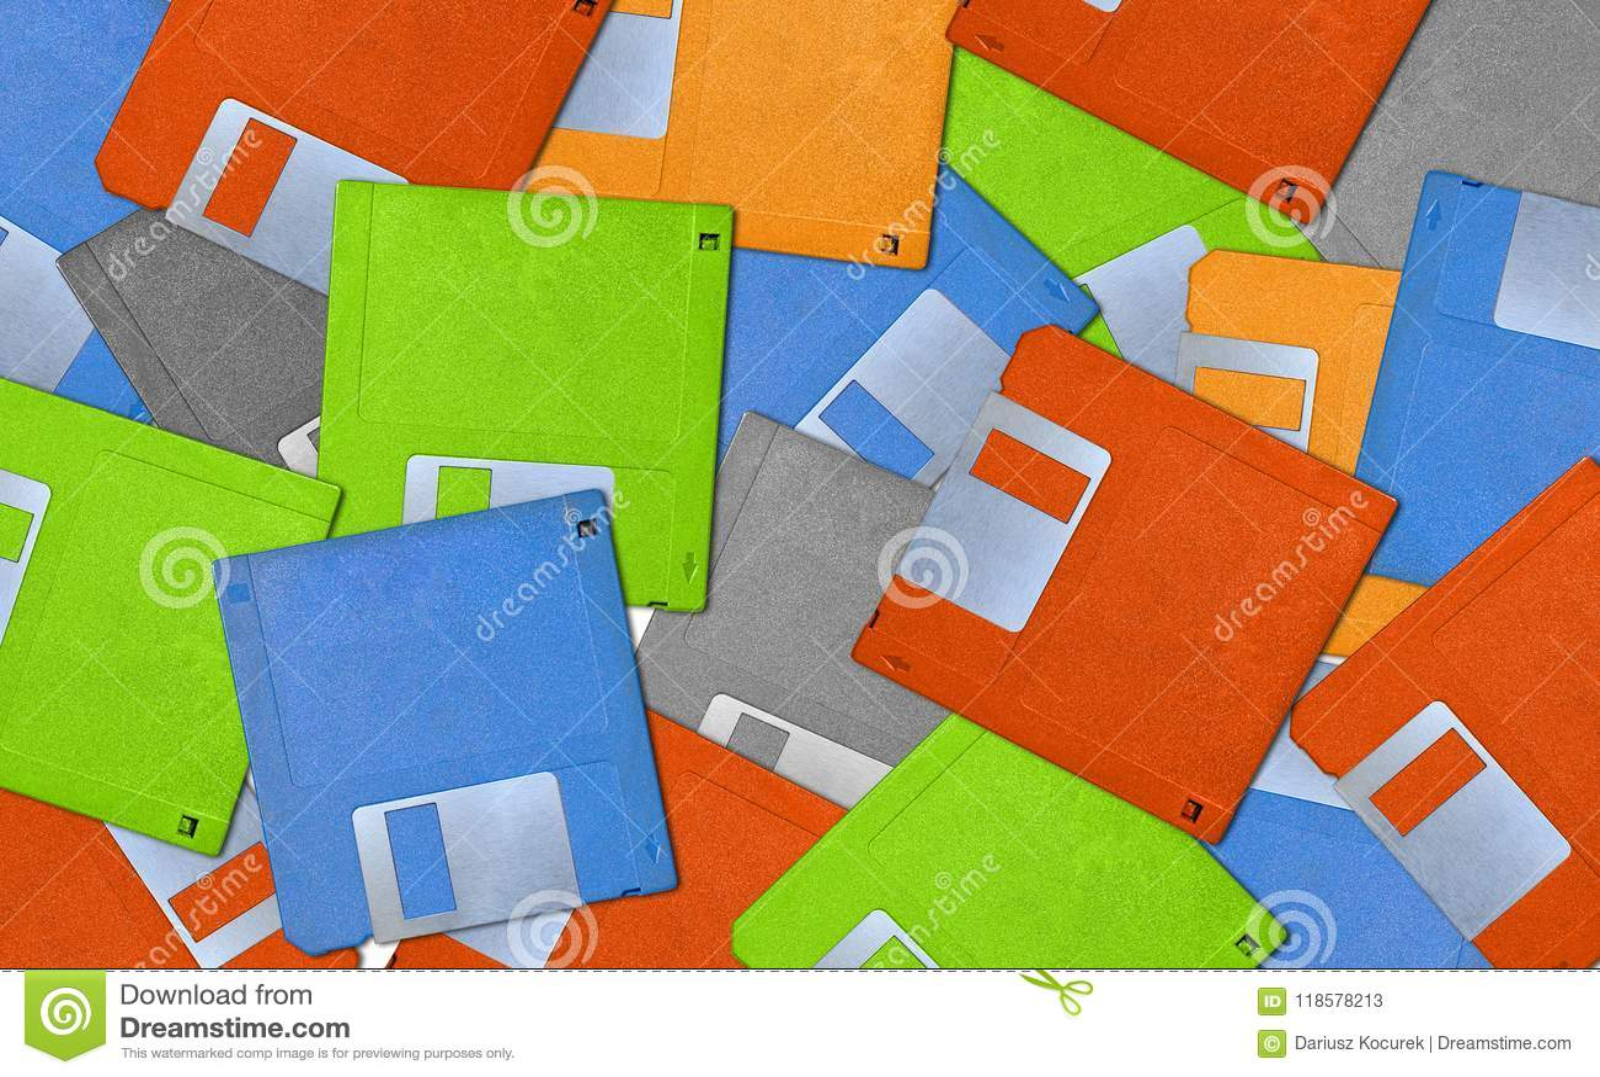 Fondo colorido con las diskettes viejas - disquete